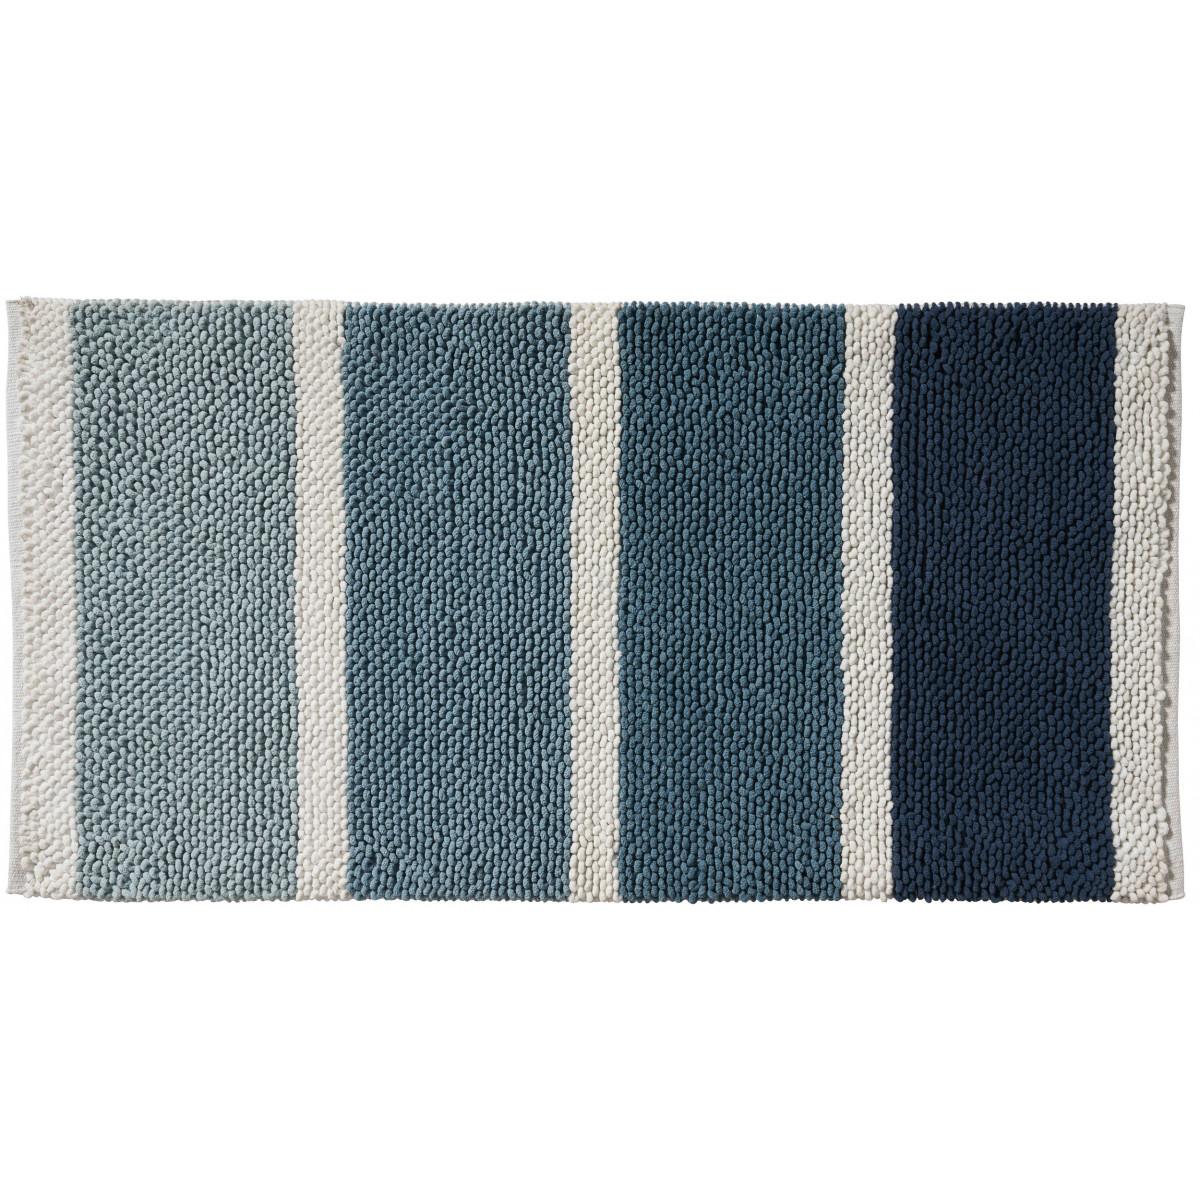 Tapis de bain fantaisie 60x120cm Bleu Mykonos